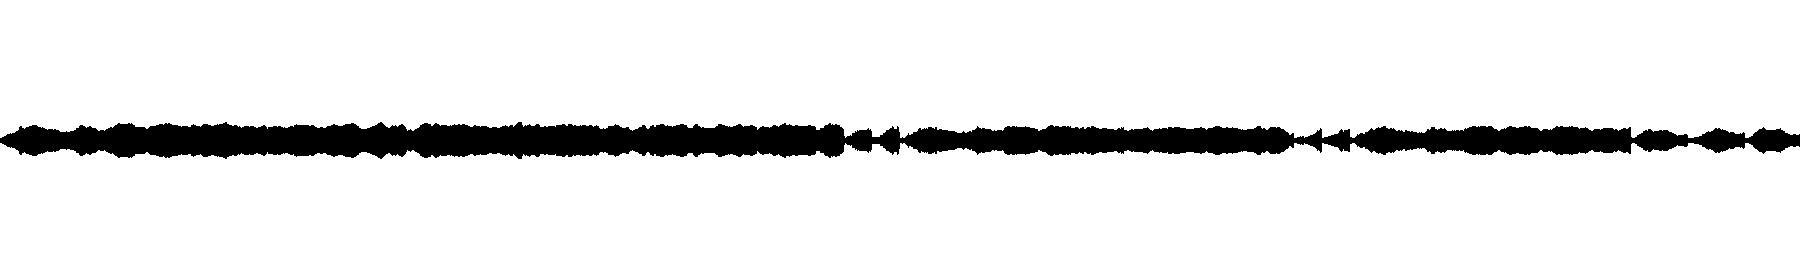 trm 125 c whistle1